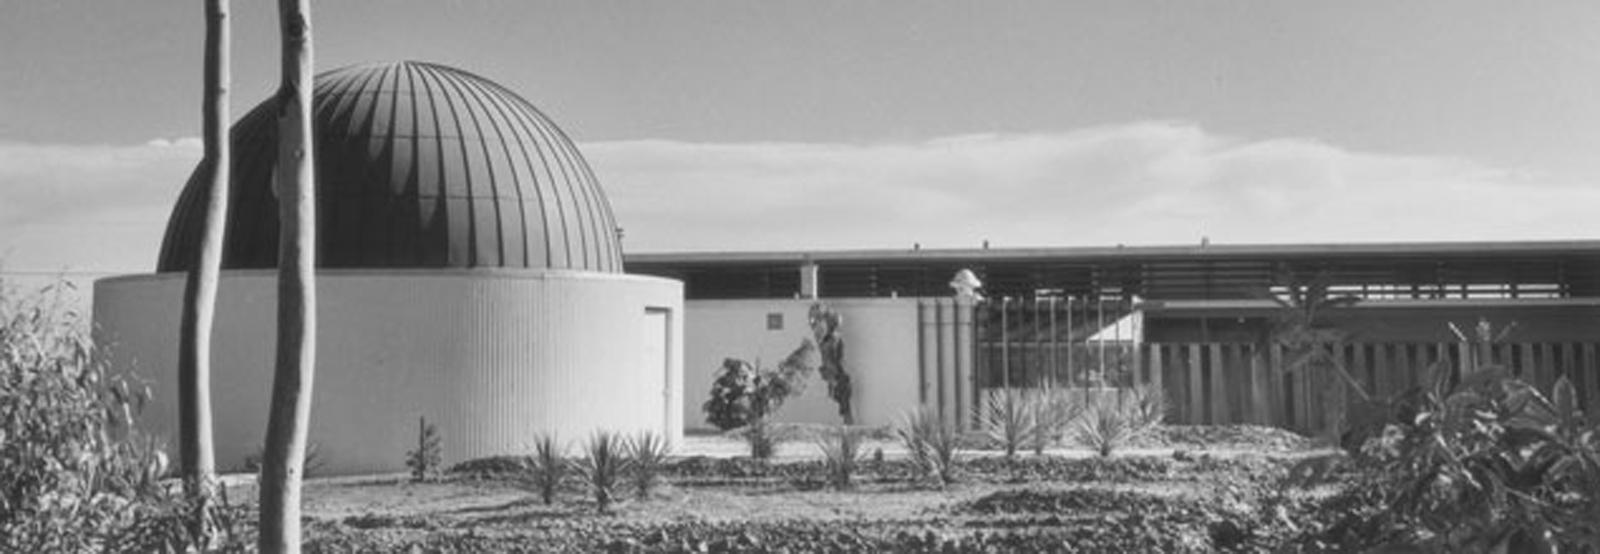 OCC-Planetarium_banner_2004_1600.jpg